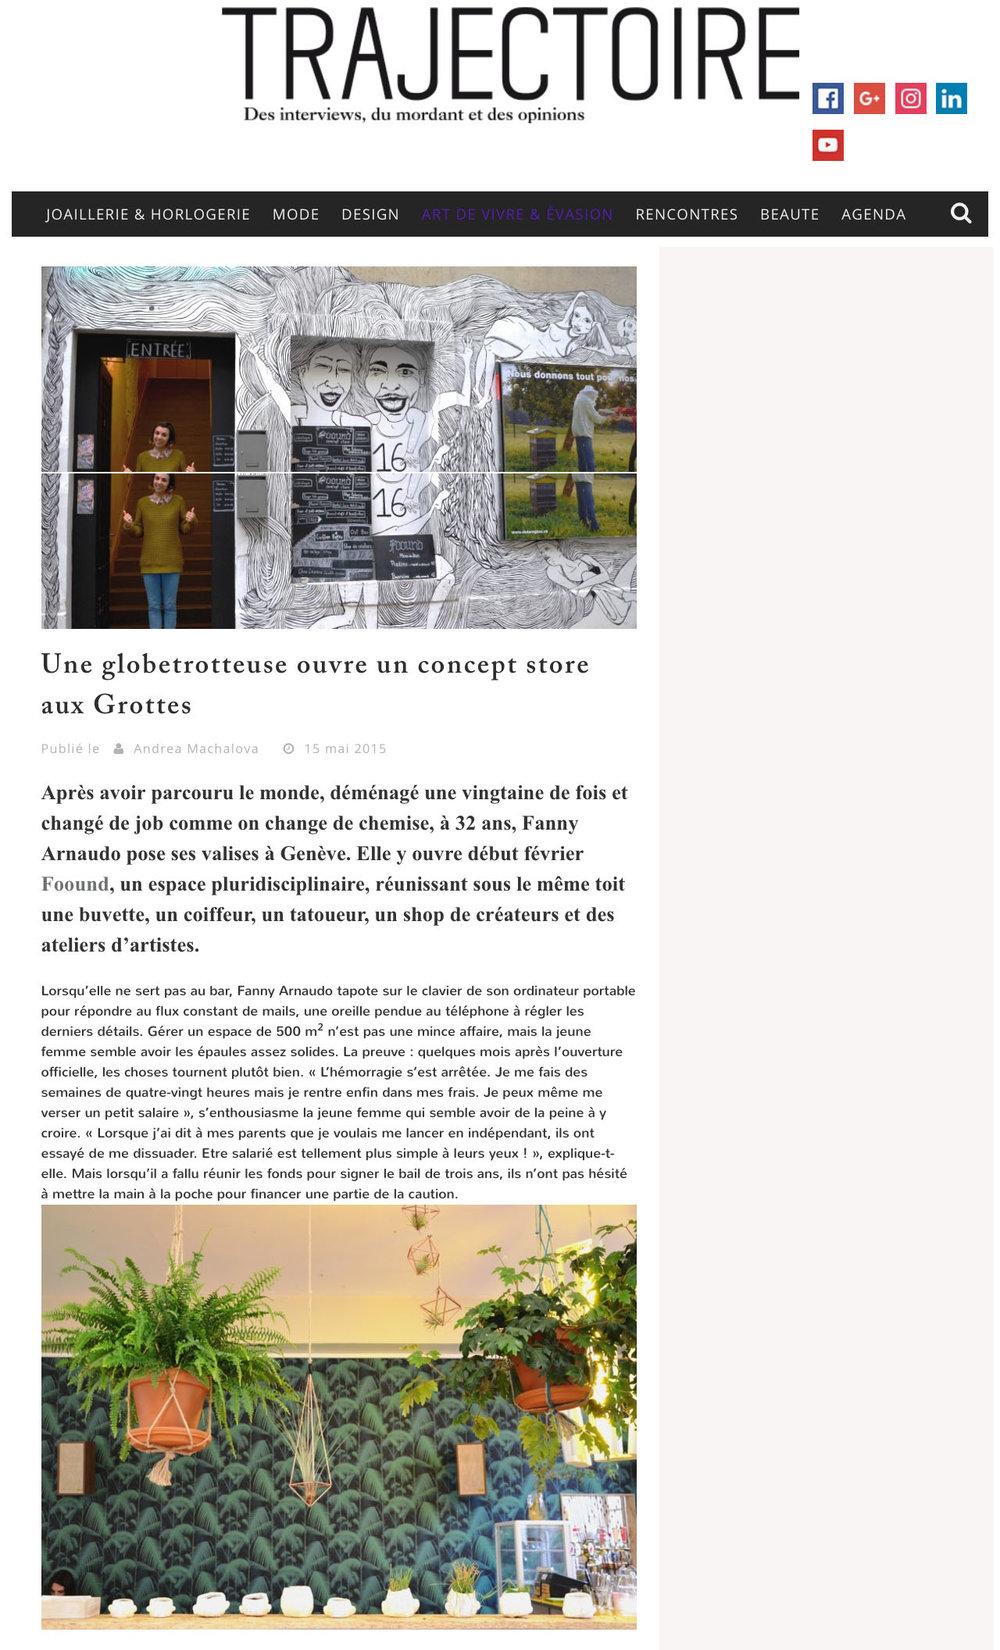 Trajectoire // 15 novembre 2015